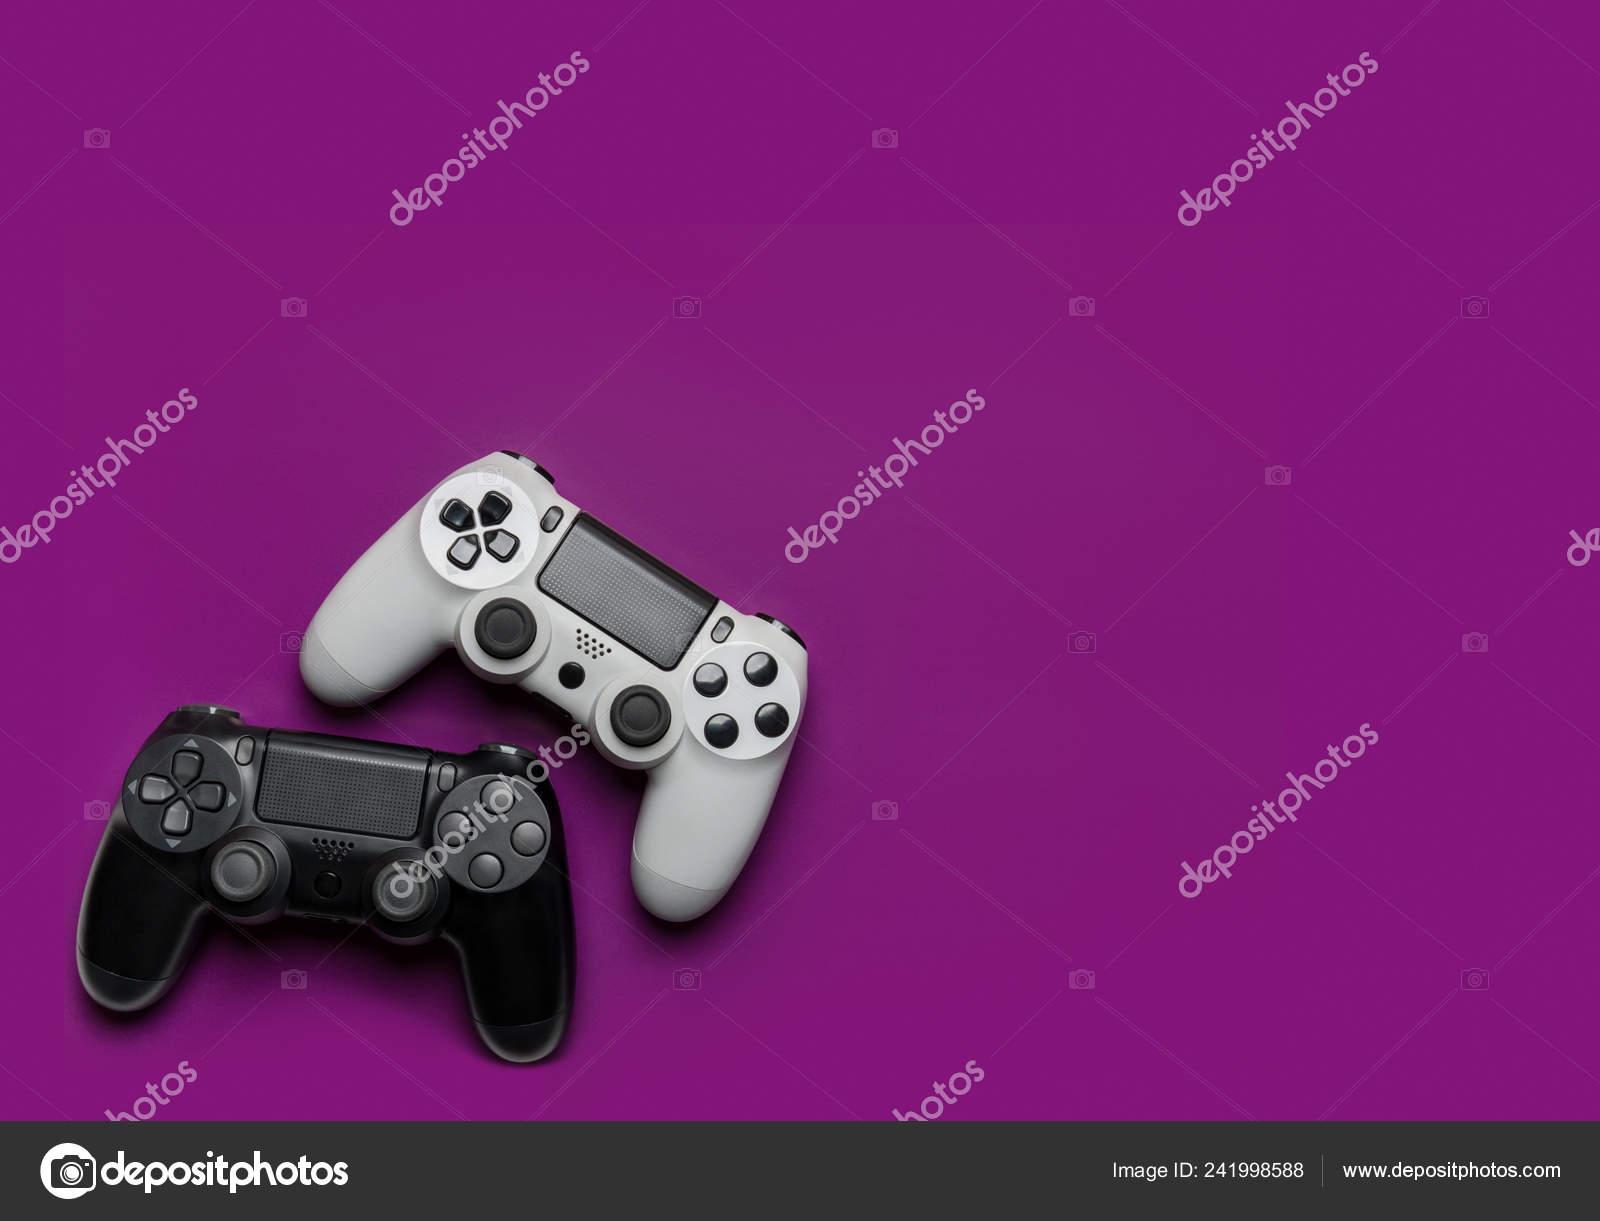 depositphotos 241998588 stock photo black white gamepads purple background